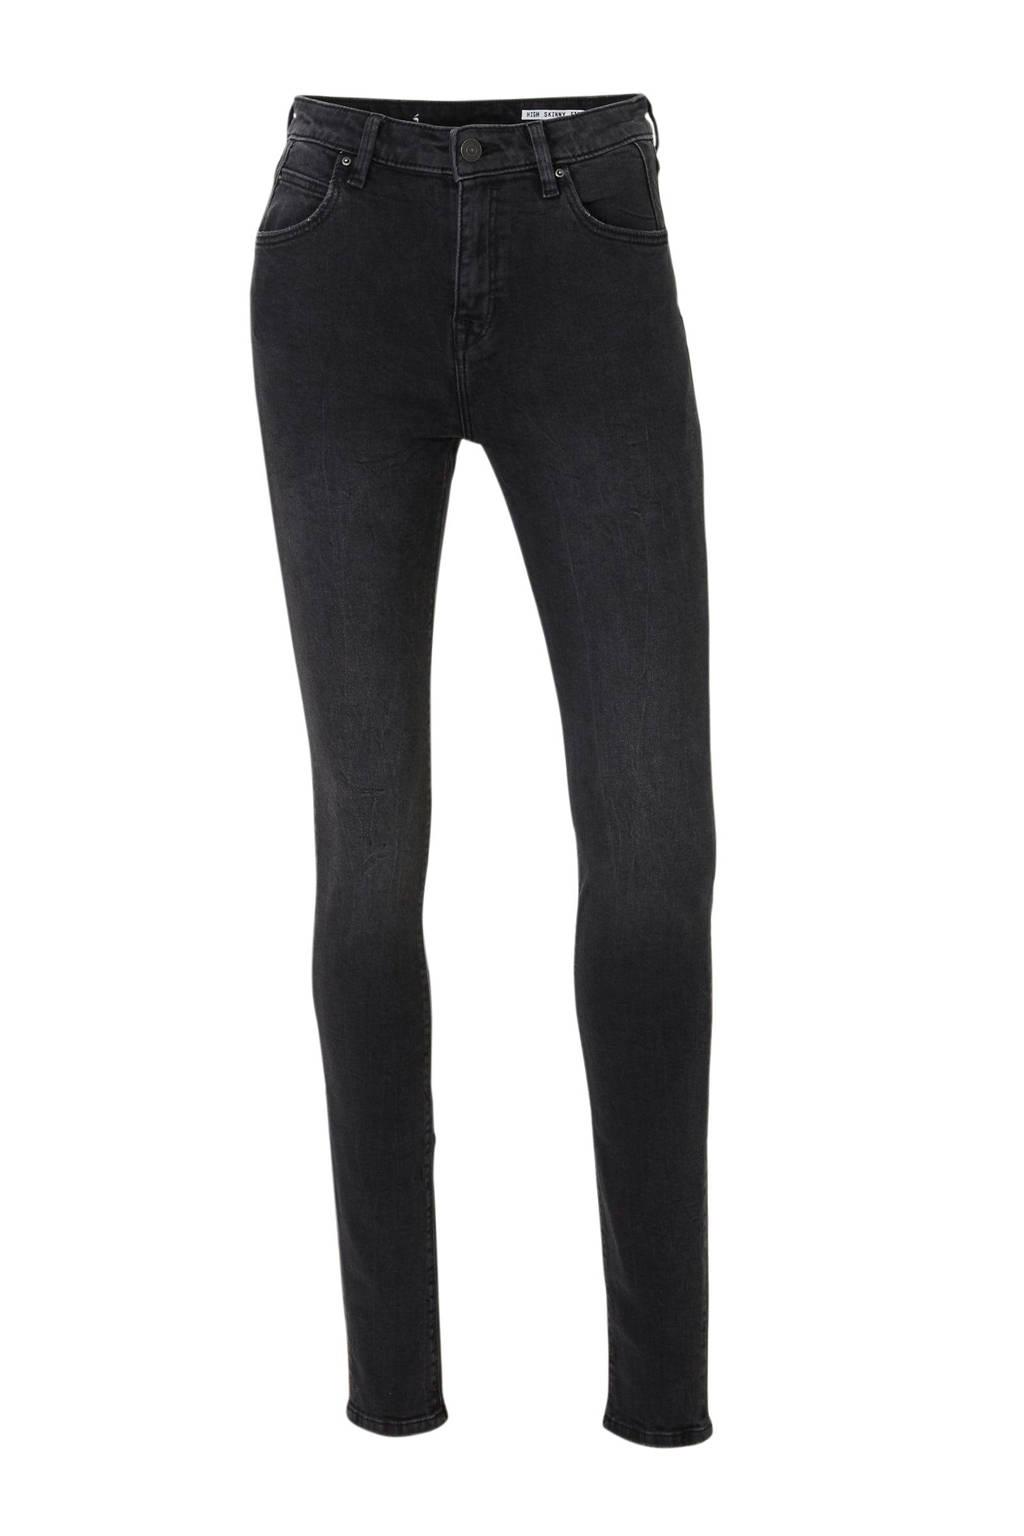 edc Women high waist skinny jeans zwart, Zwart